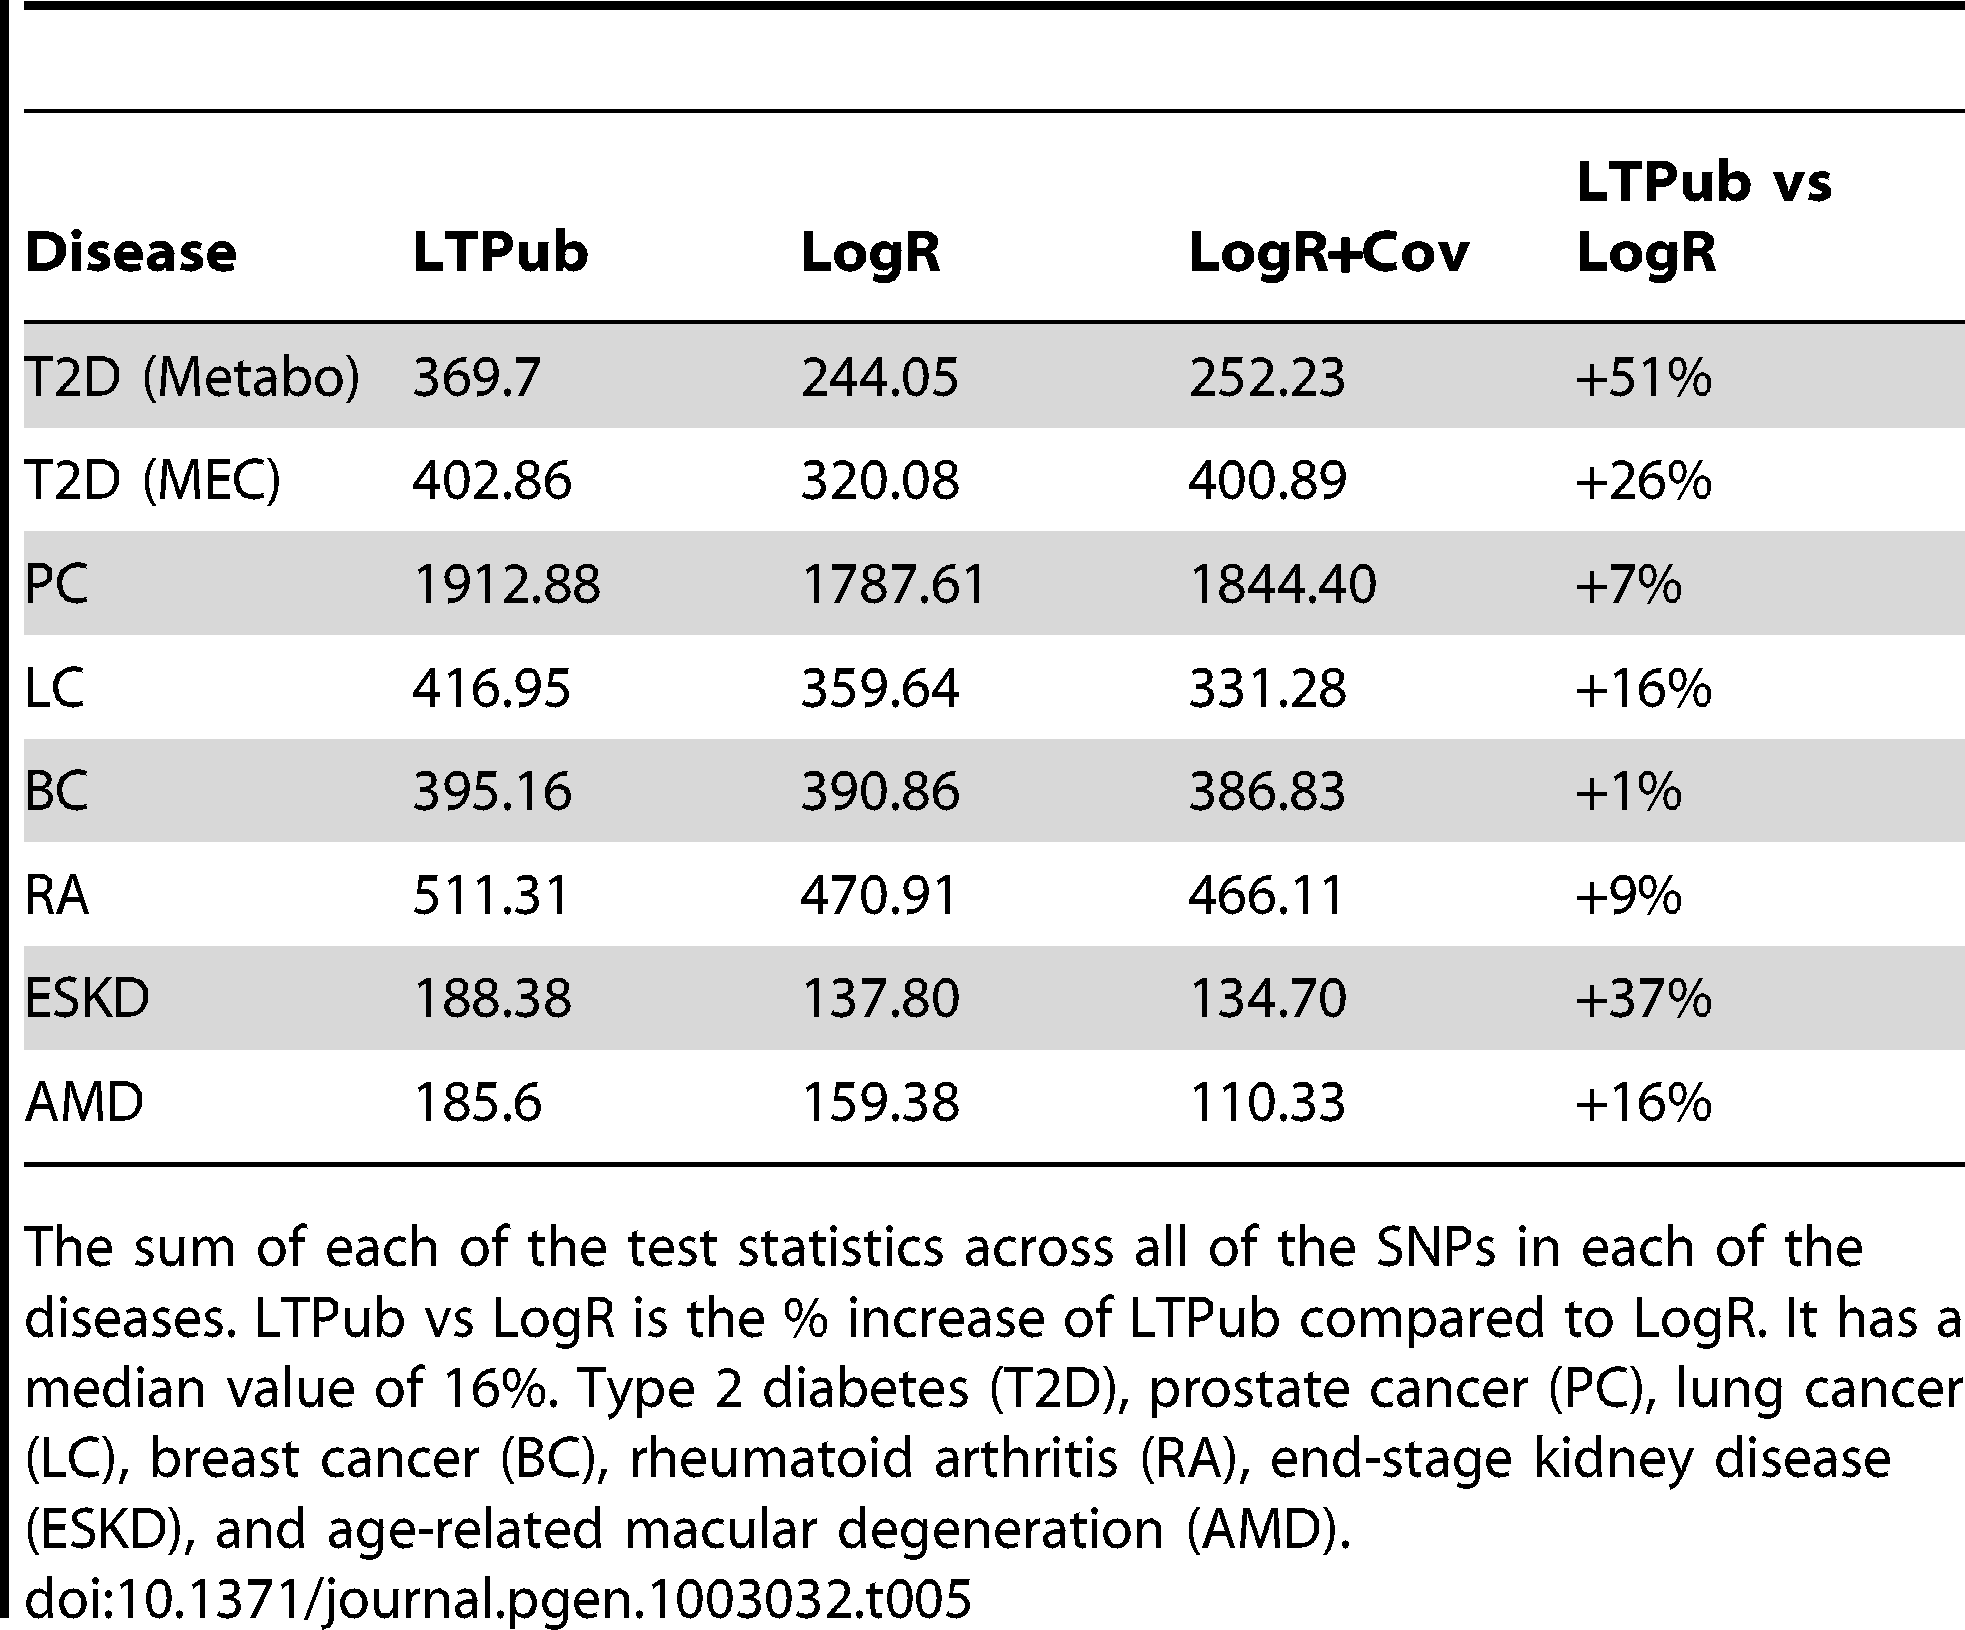 Summary statistics across all datasets.